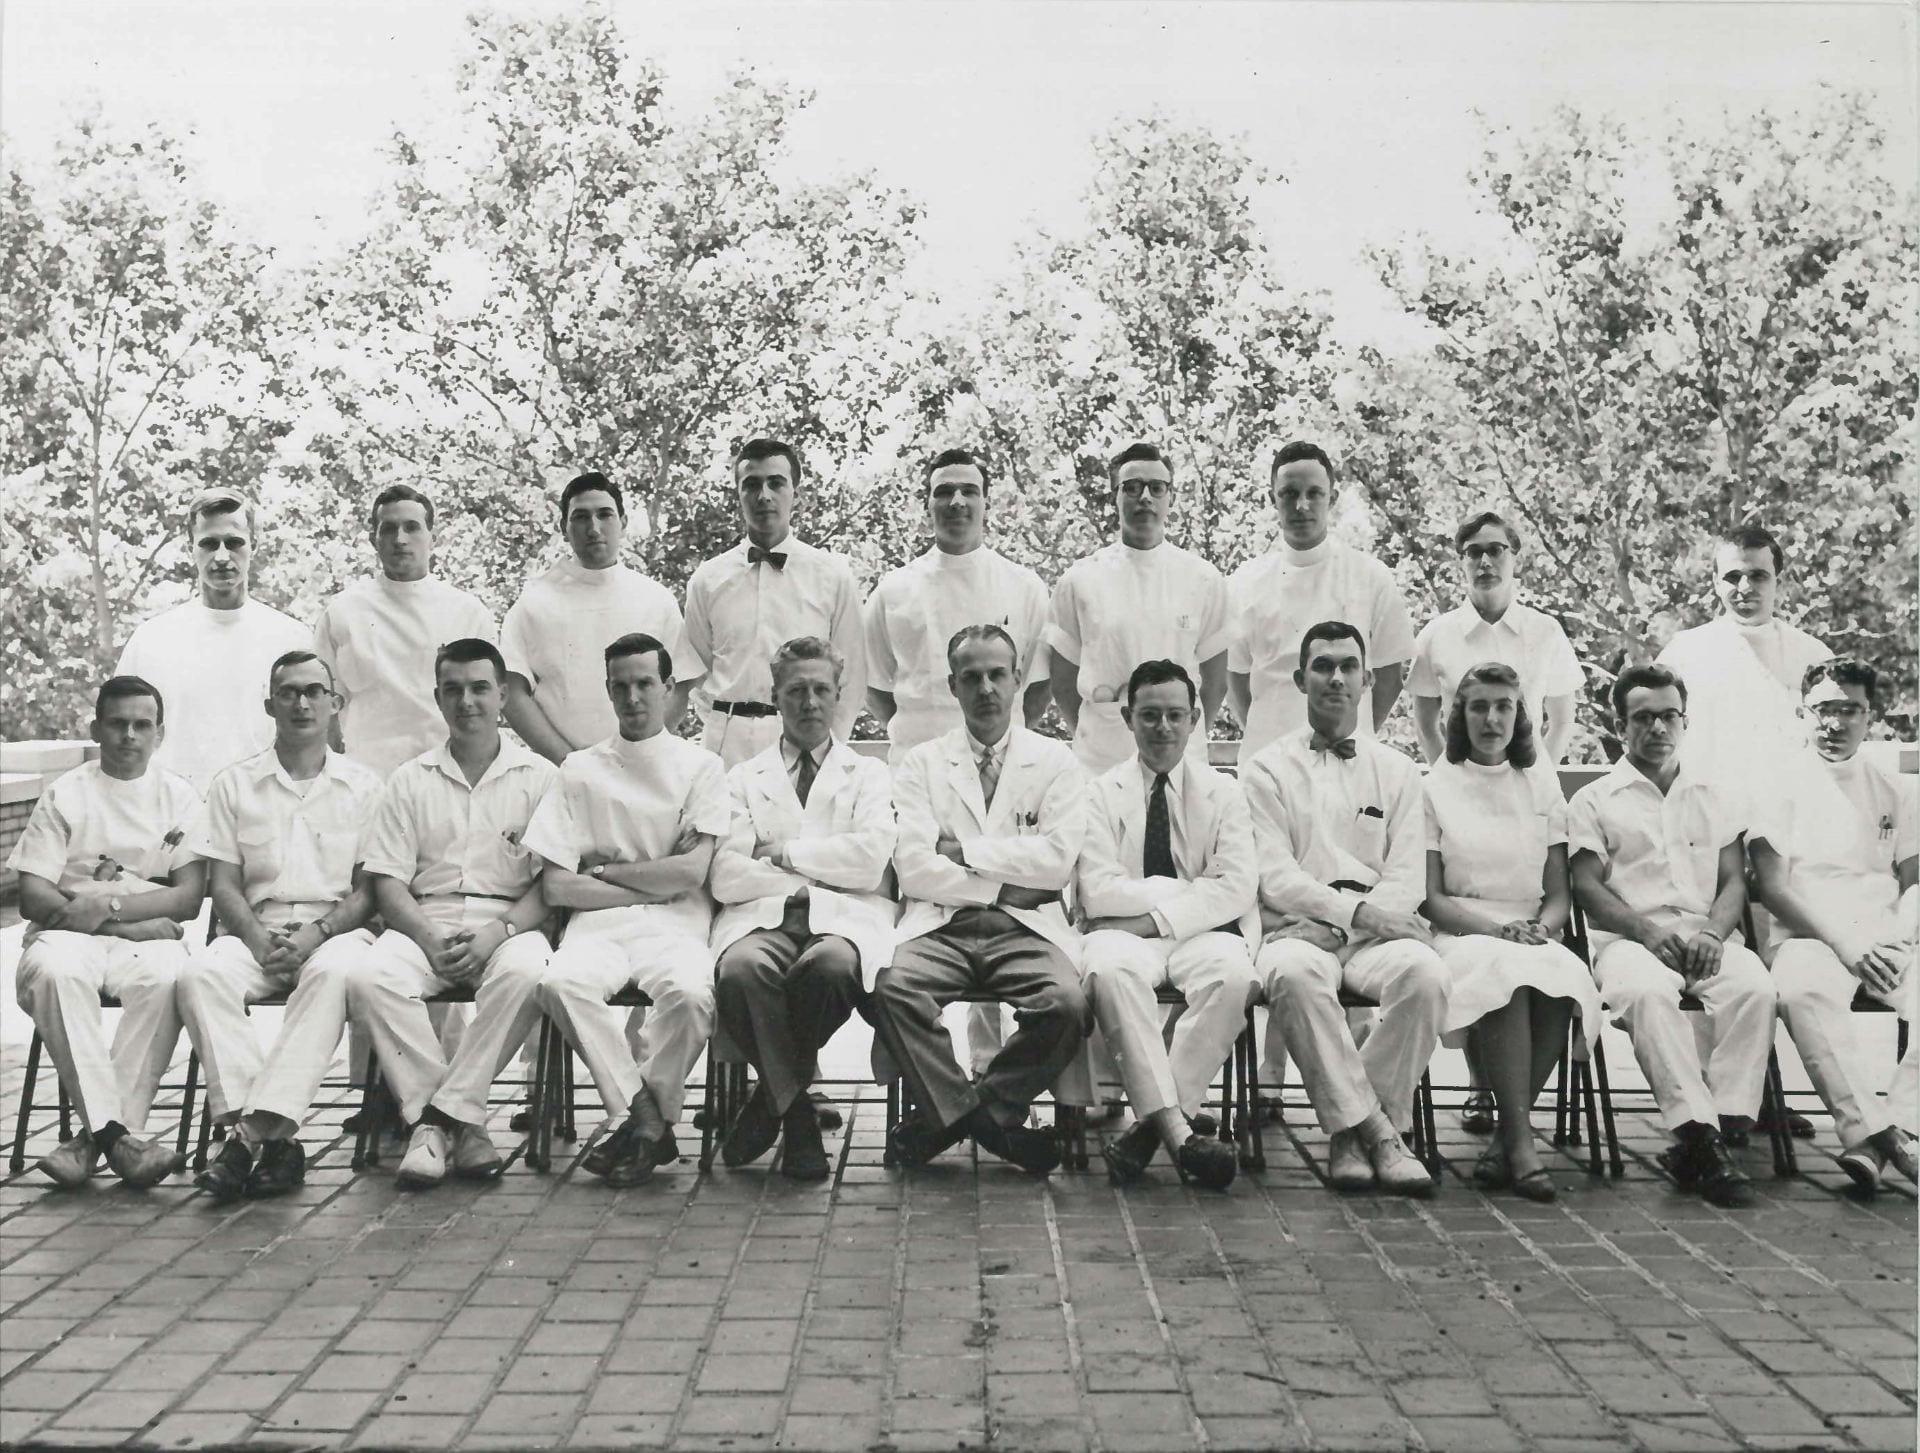 1951 Housestaff Photo (1)